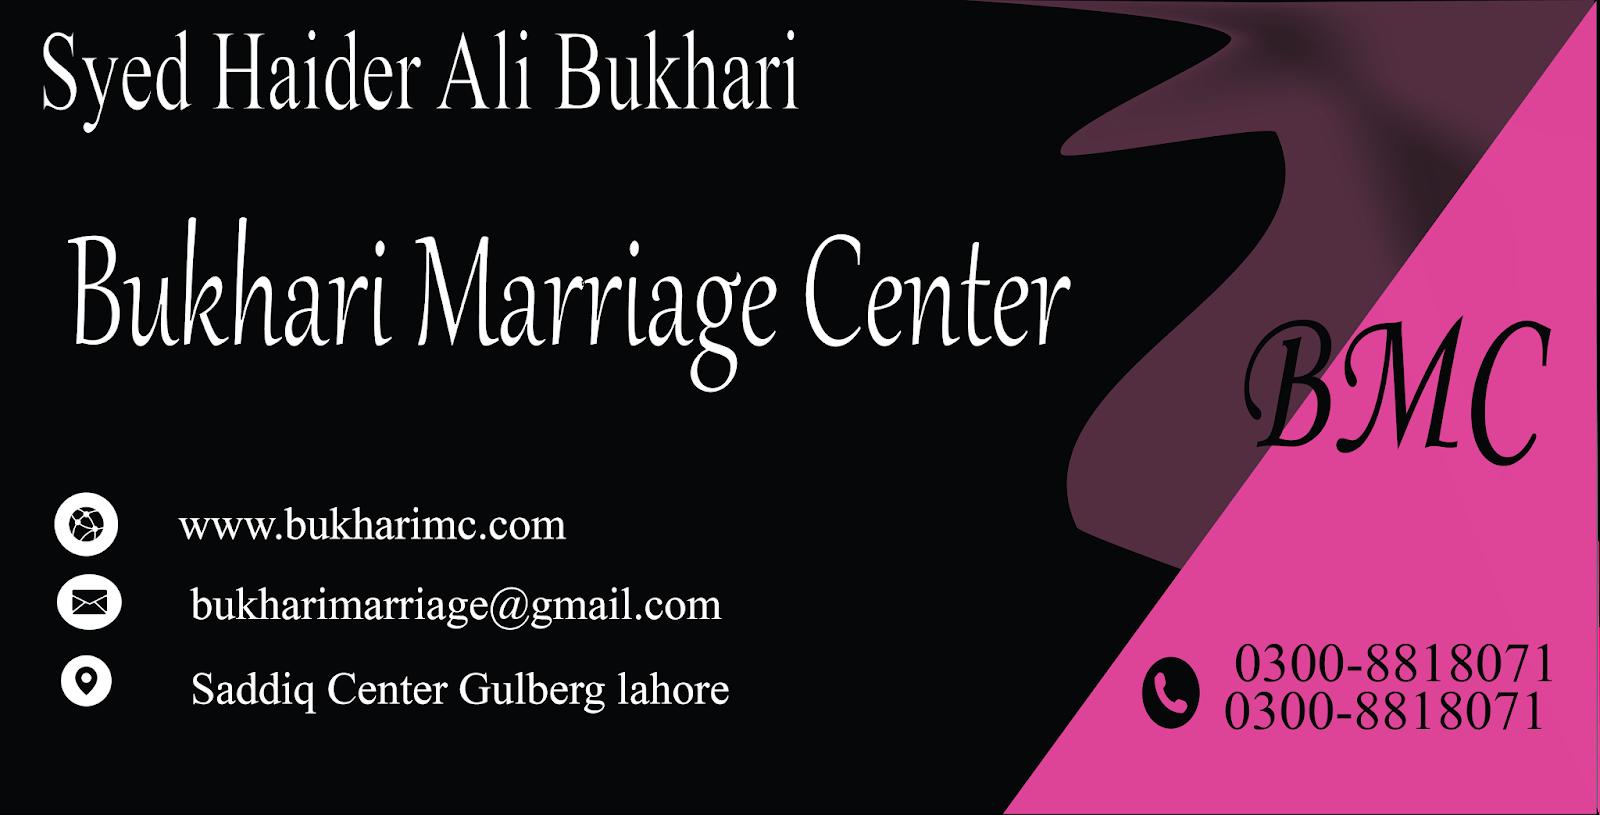 June 2019 ~ BUKHARI MARRIAGE CENTER